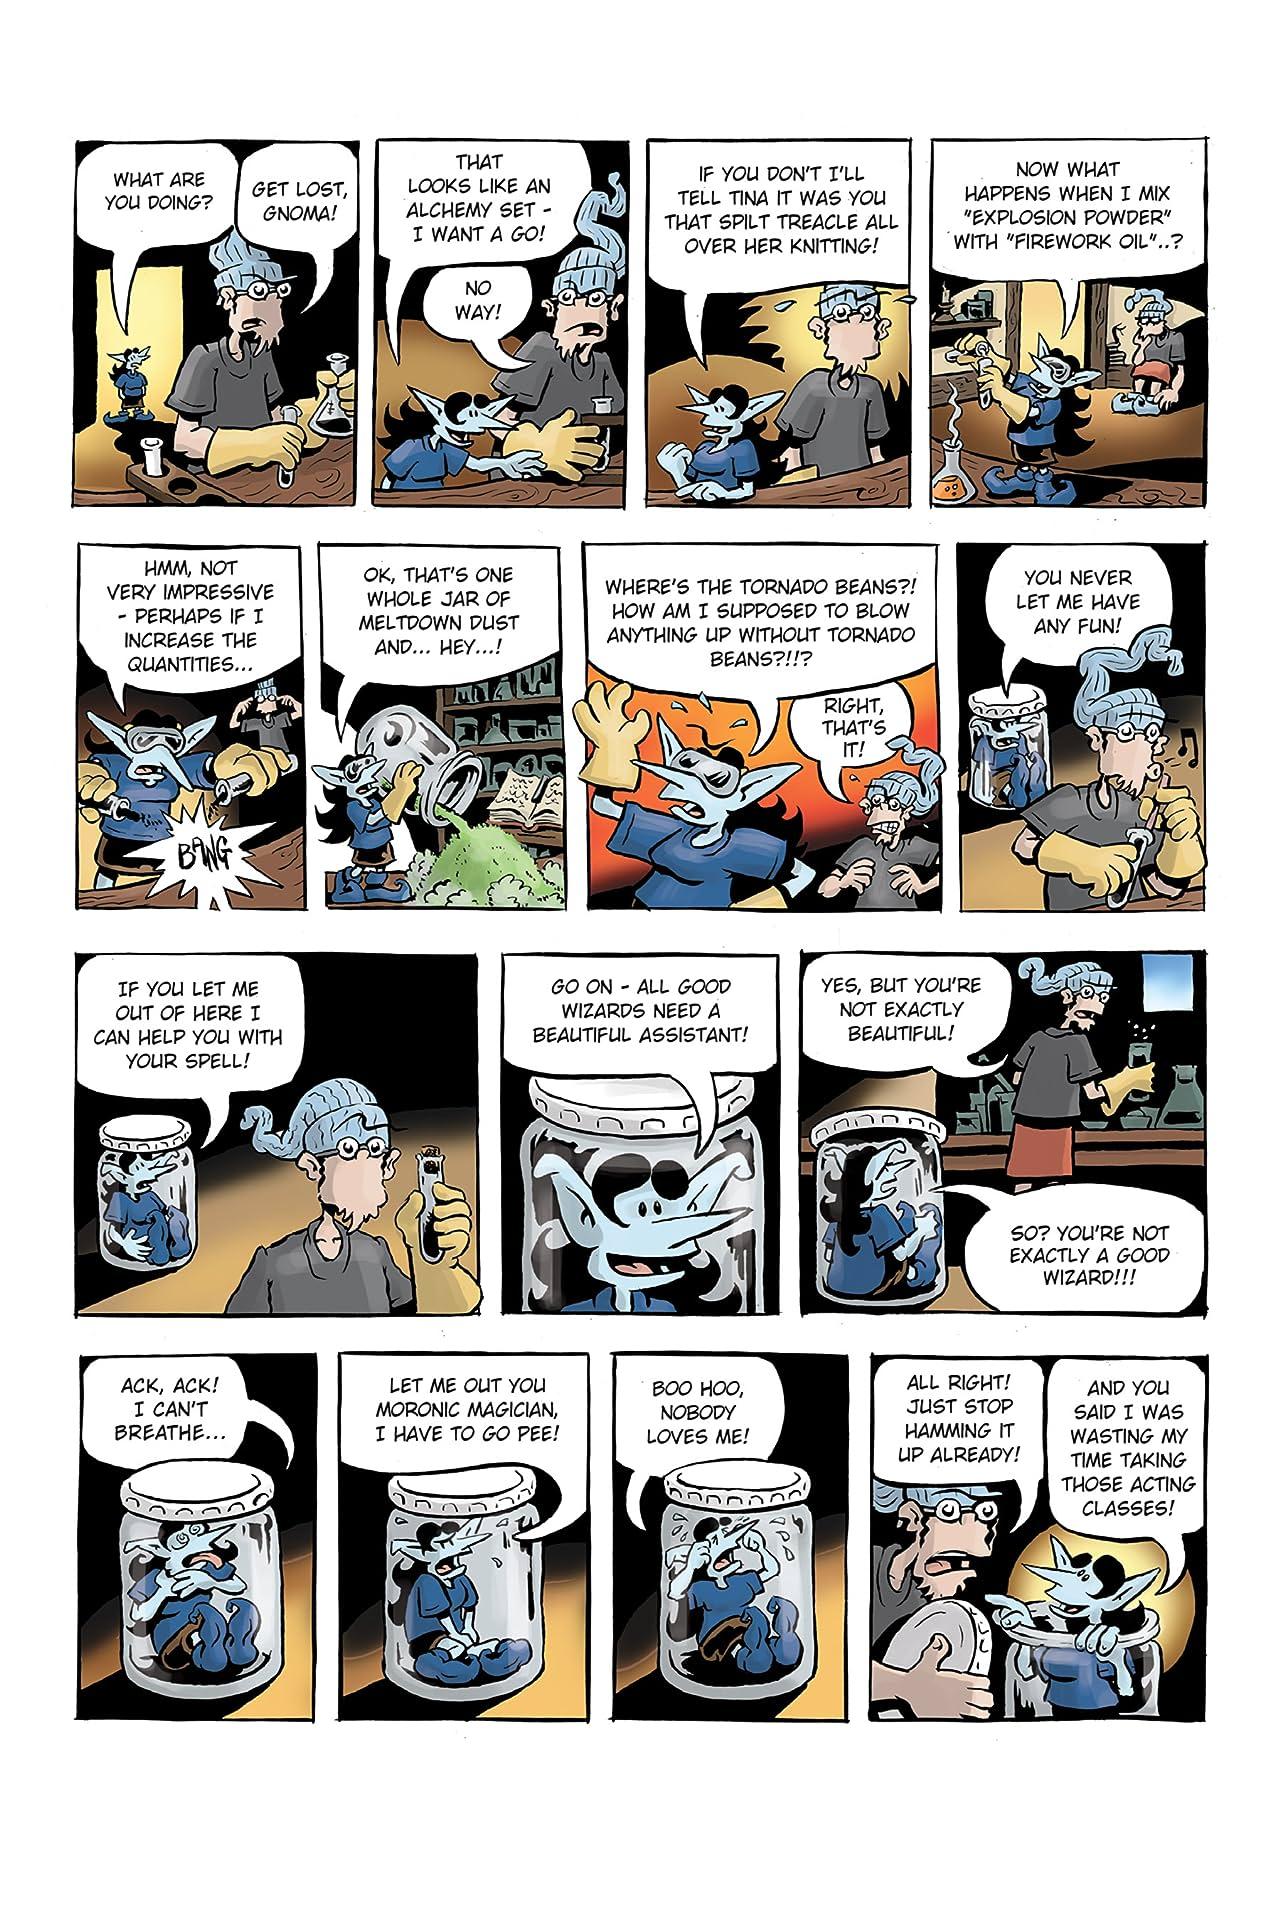 Pewfell Vol. 4